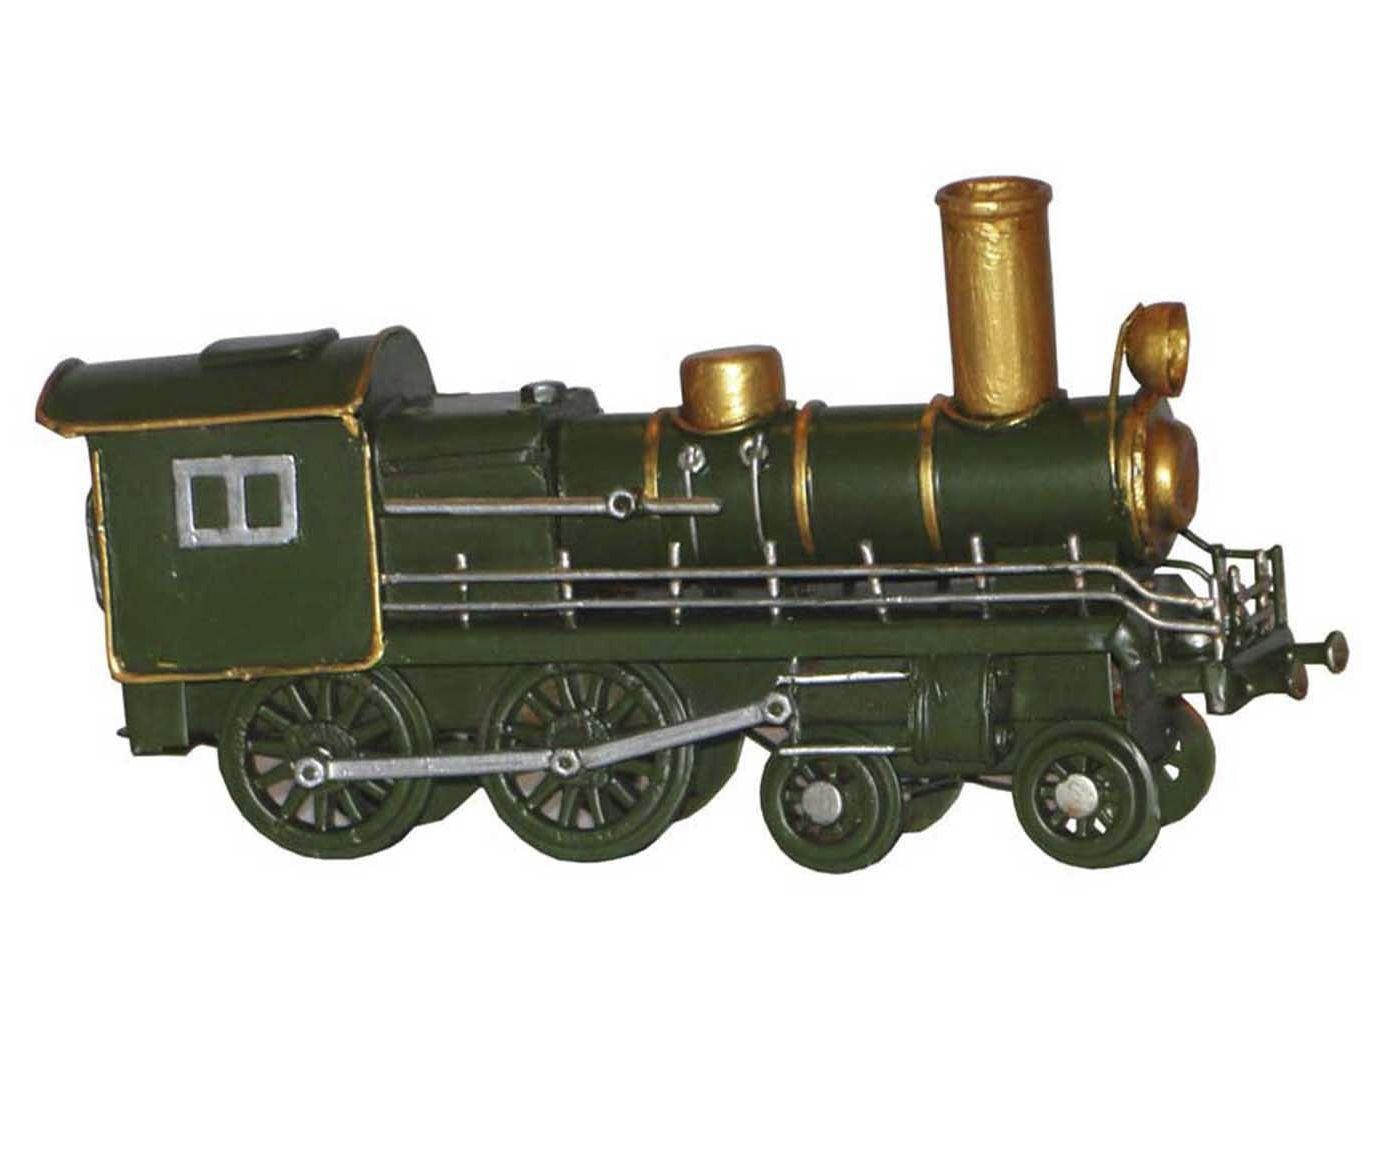 Miniatura Locomotiva Old   Westwing.com.br